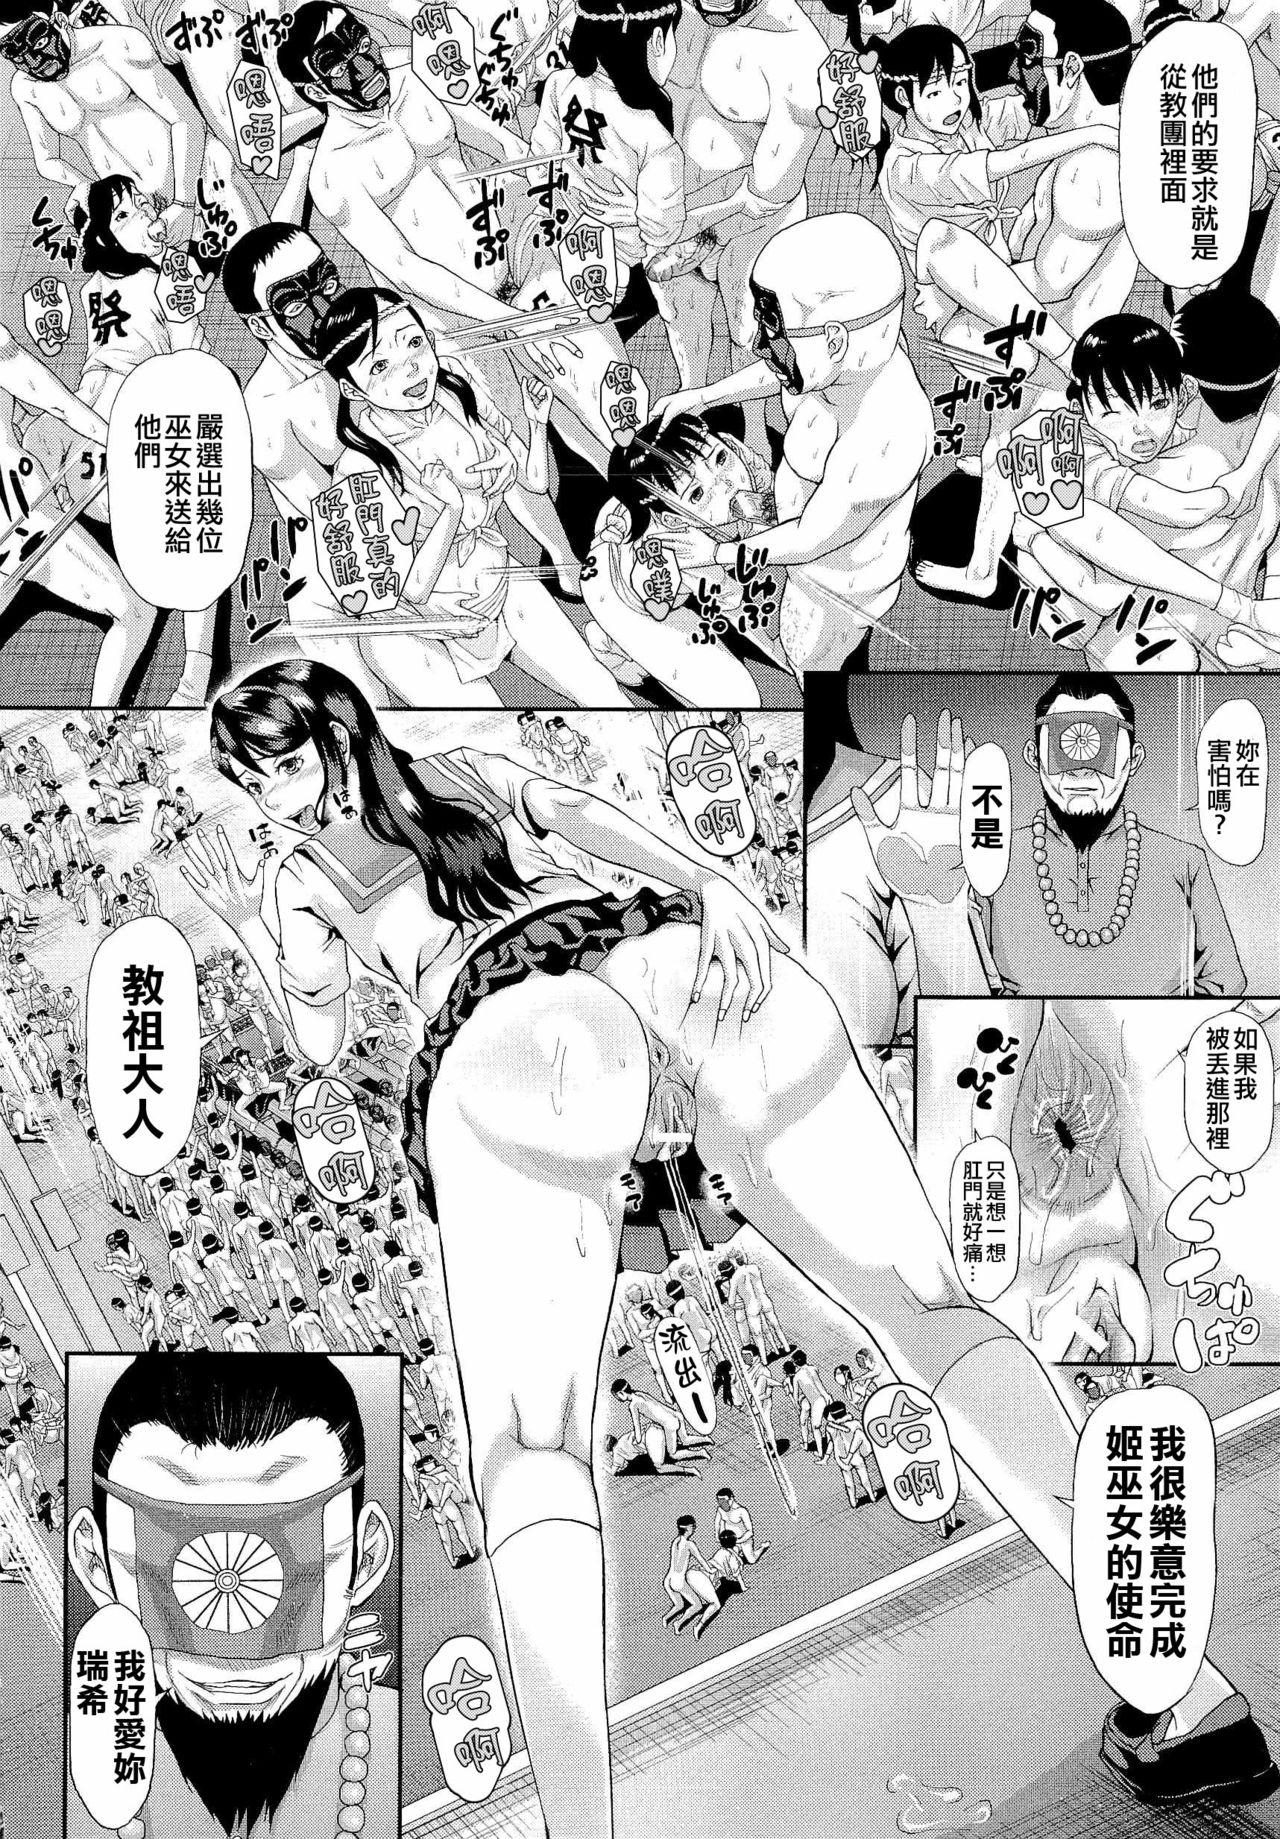 [Honebuto Danshaku] Innou Kaizou Program ~Oyako Zecchou Cult Ochi~ [Chinese]【不想记名重嵌--高质量图源】 182